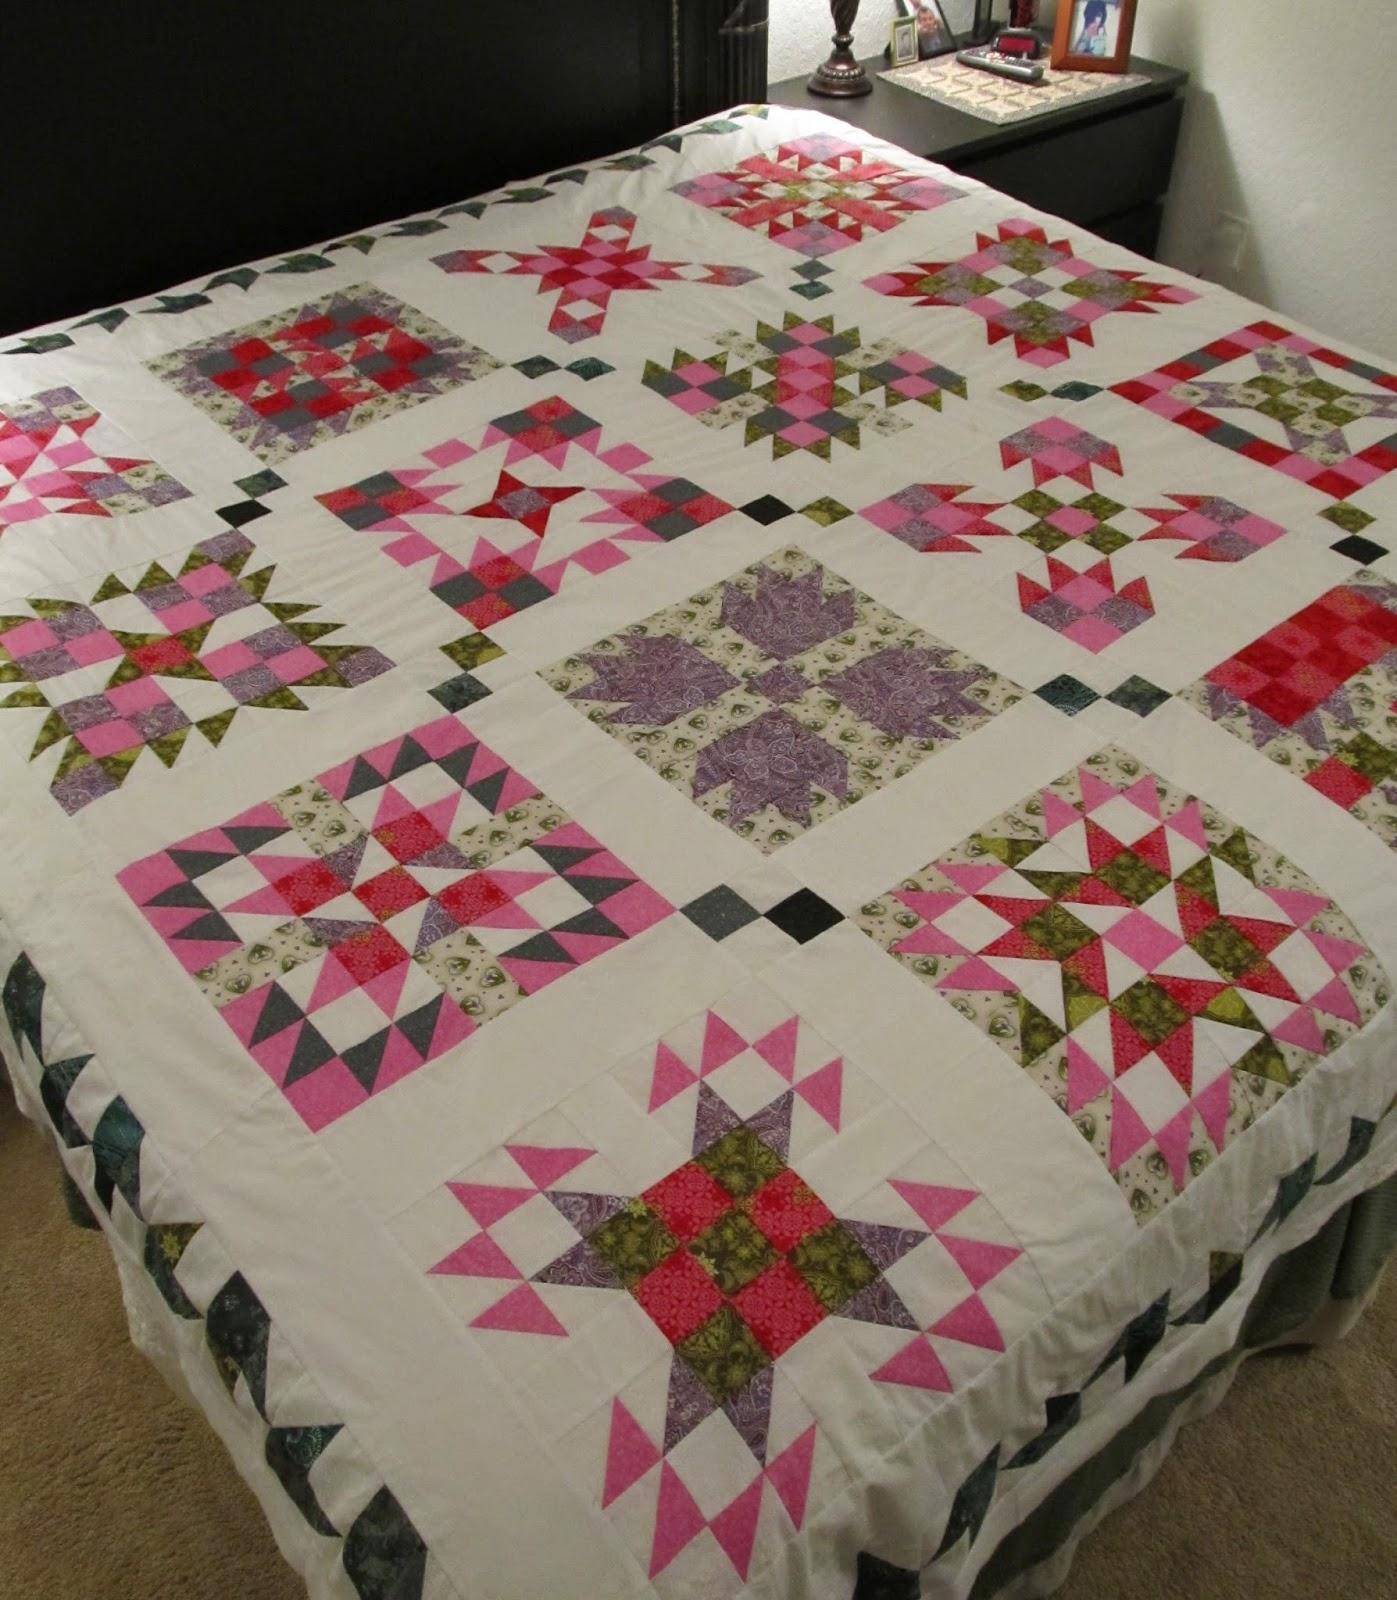 quilt pattern book from The Quilt Ladies - B. Annie Quilt